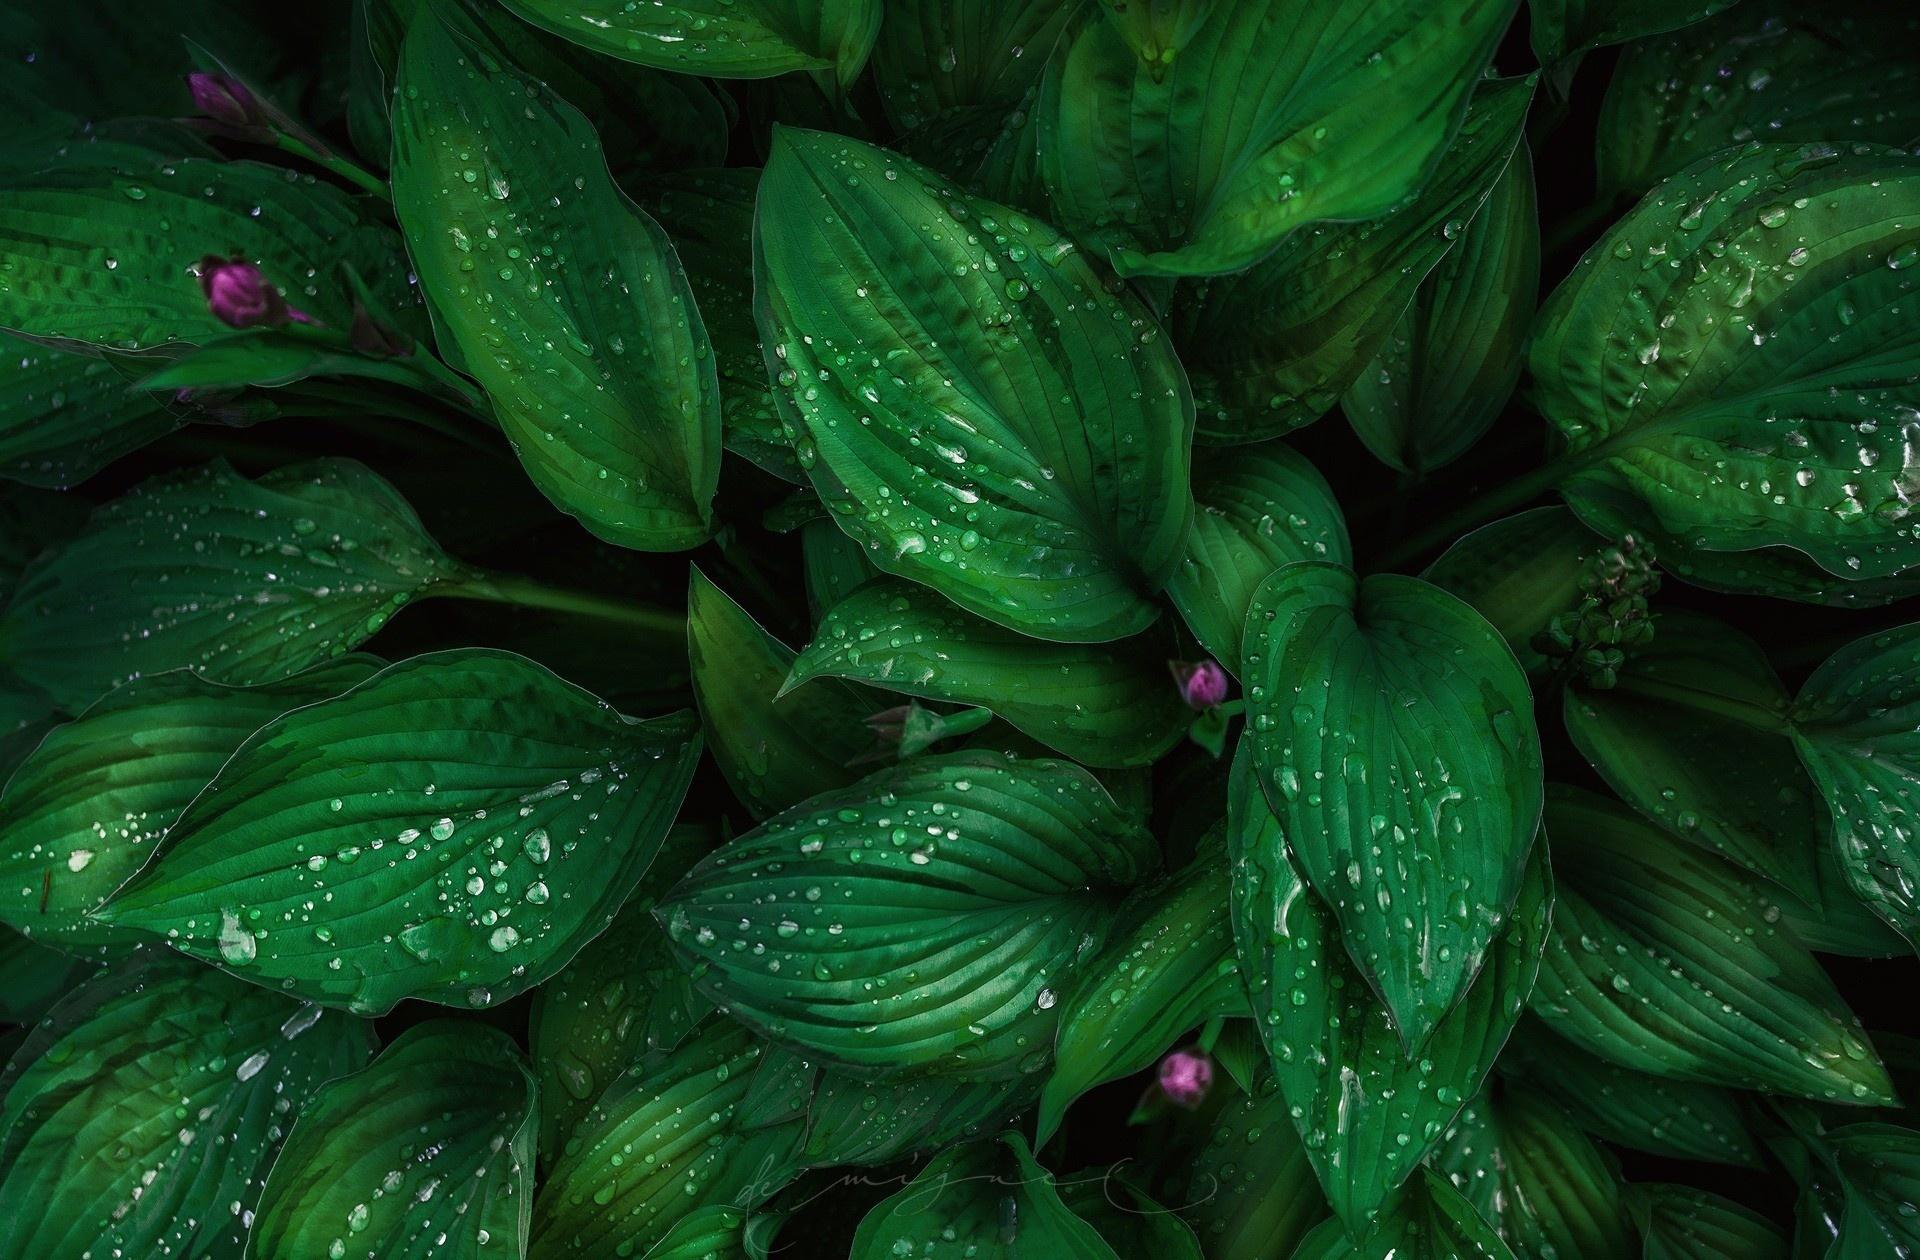 картинки на рабочий зеленого цвета прометея